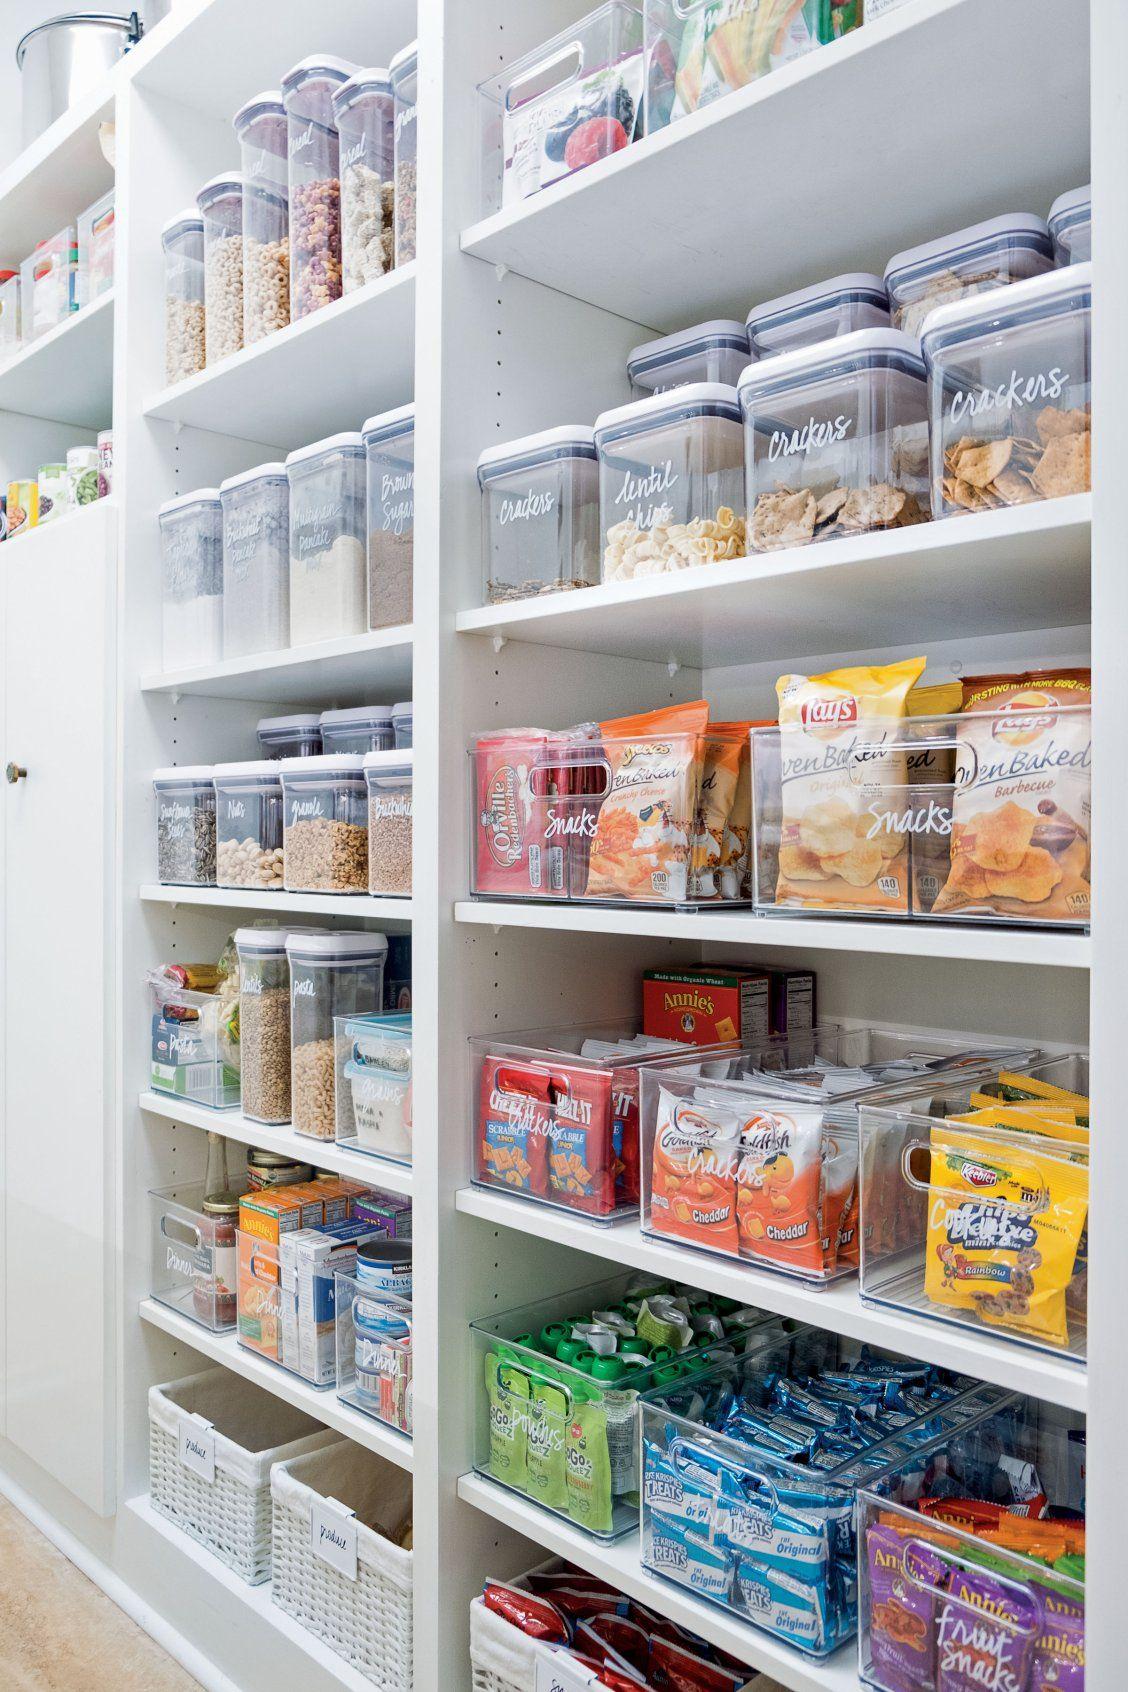 The Home Edit by Clea Shearer, Joanna Teplin: 9780525572640 | PenguinRandomHouse.com: Books